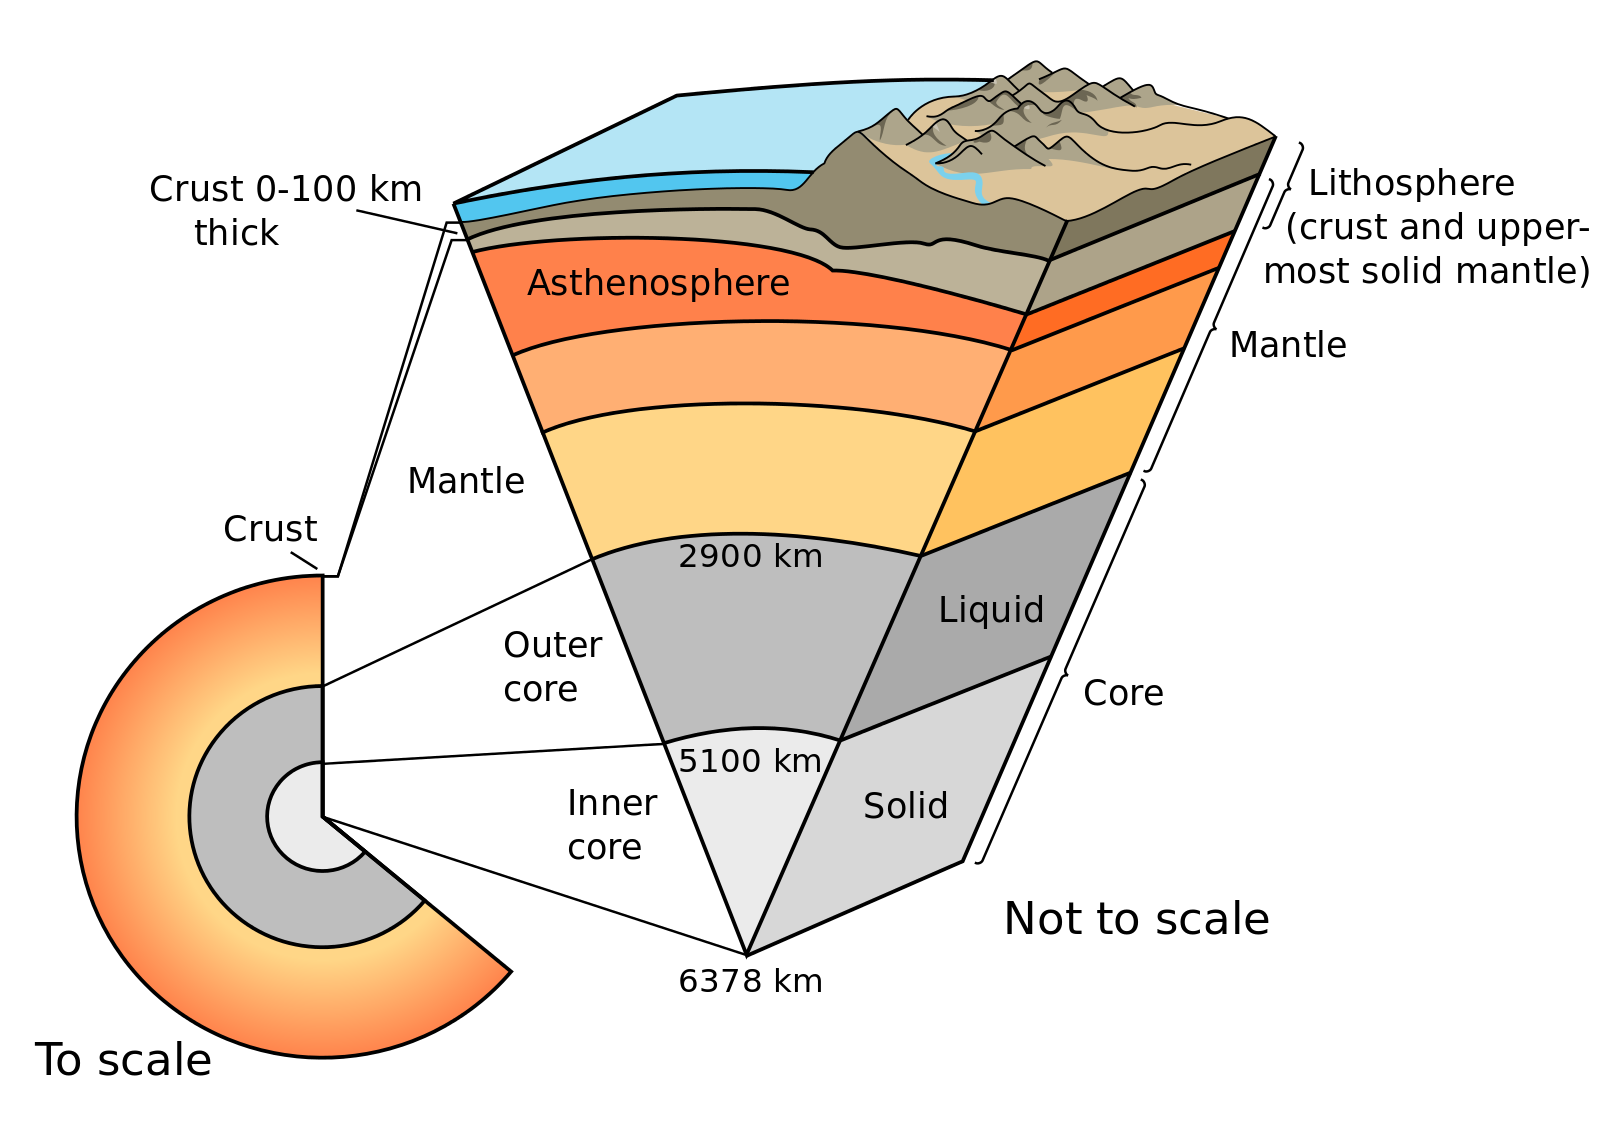 file earth cutaway schematic english svg [ 1600 x 1125 Pixel ]